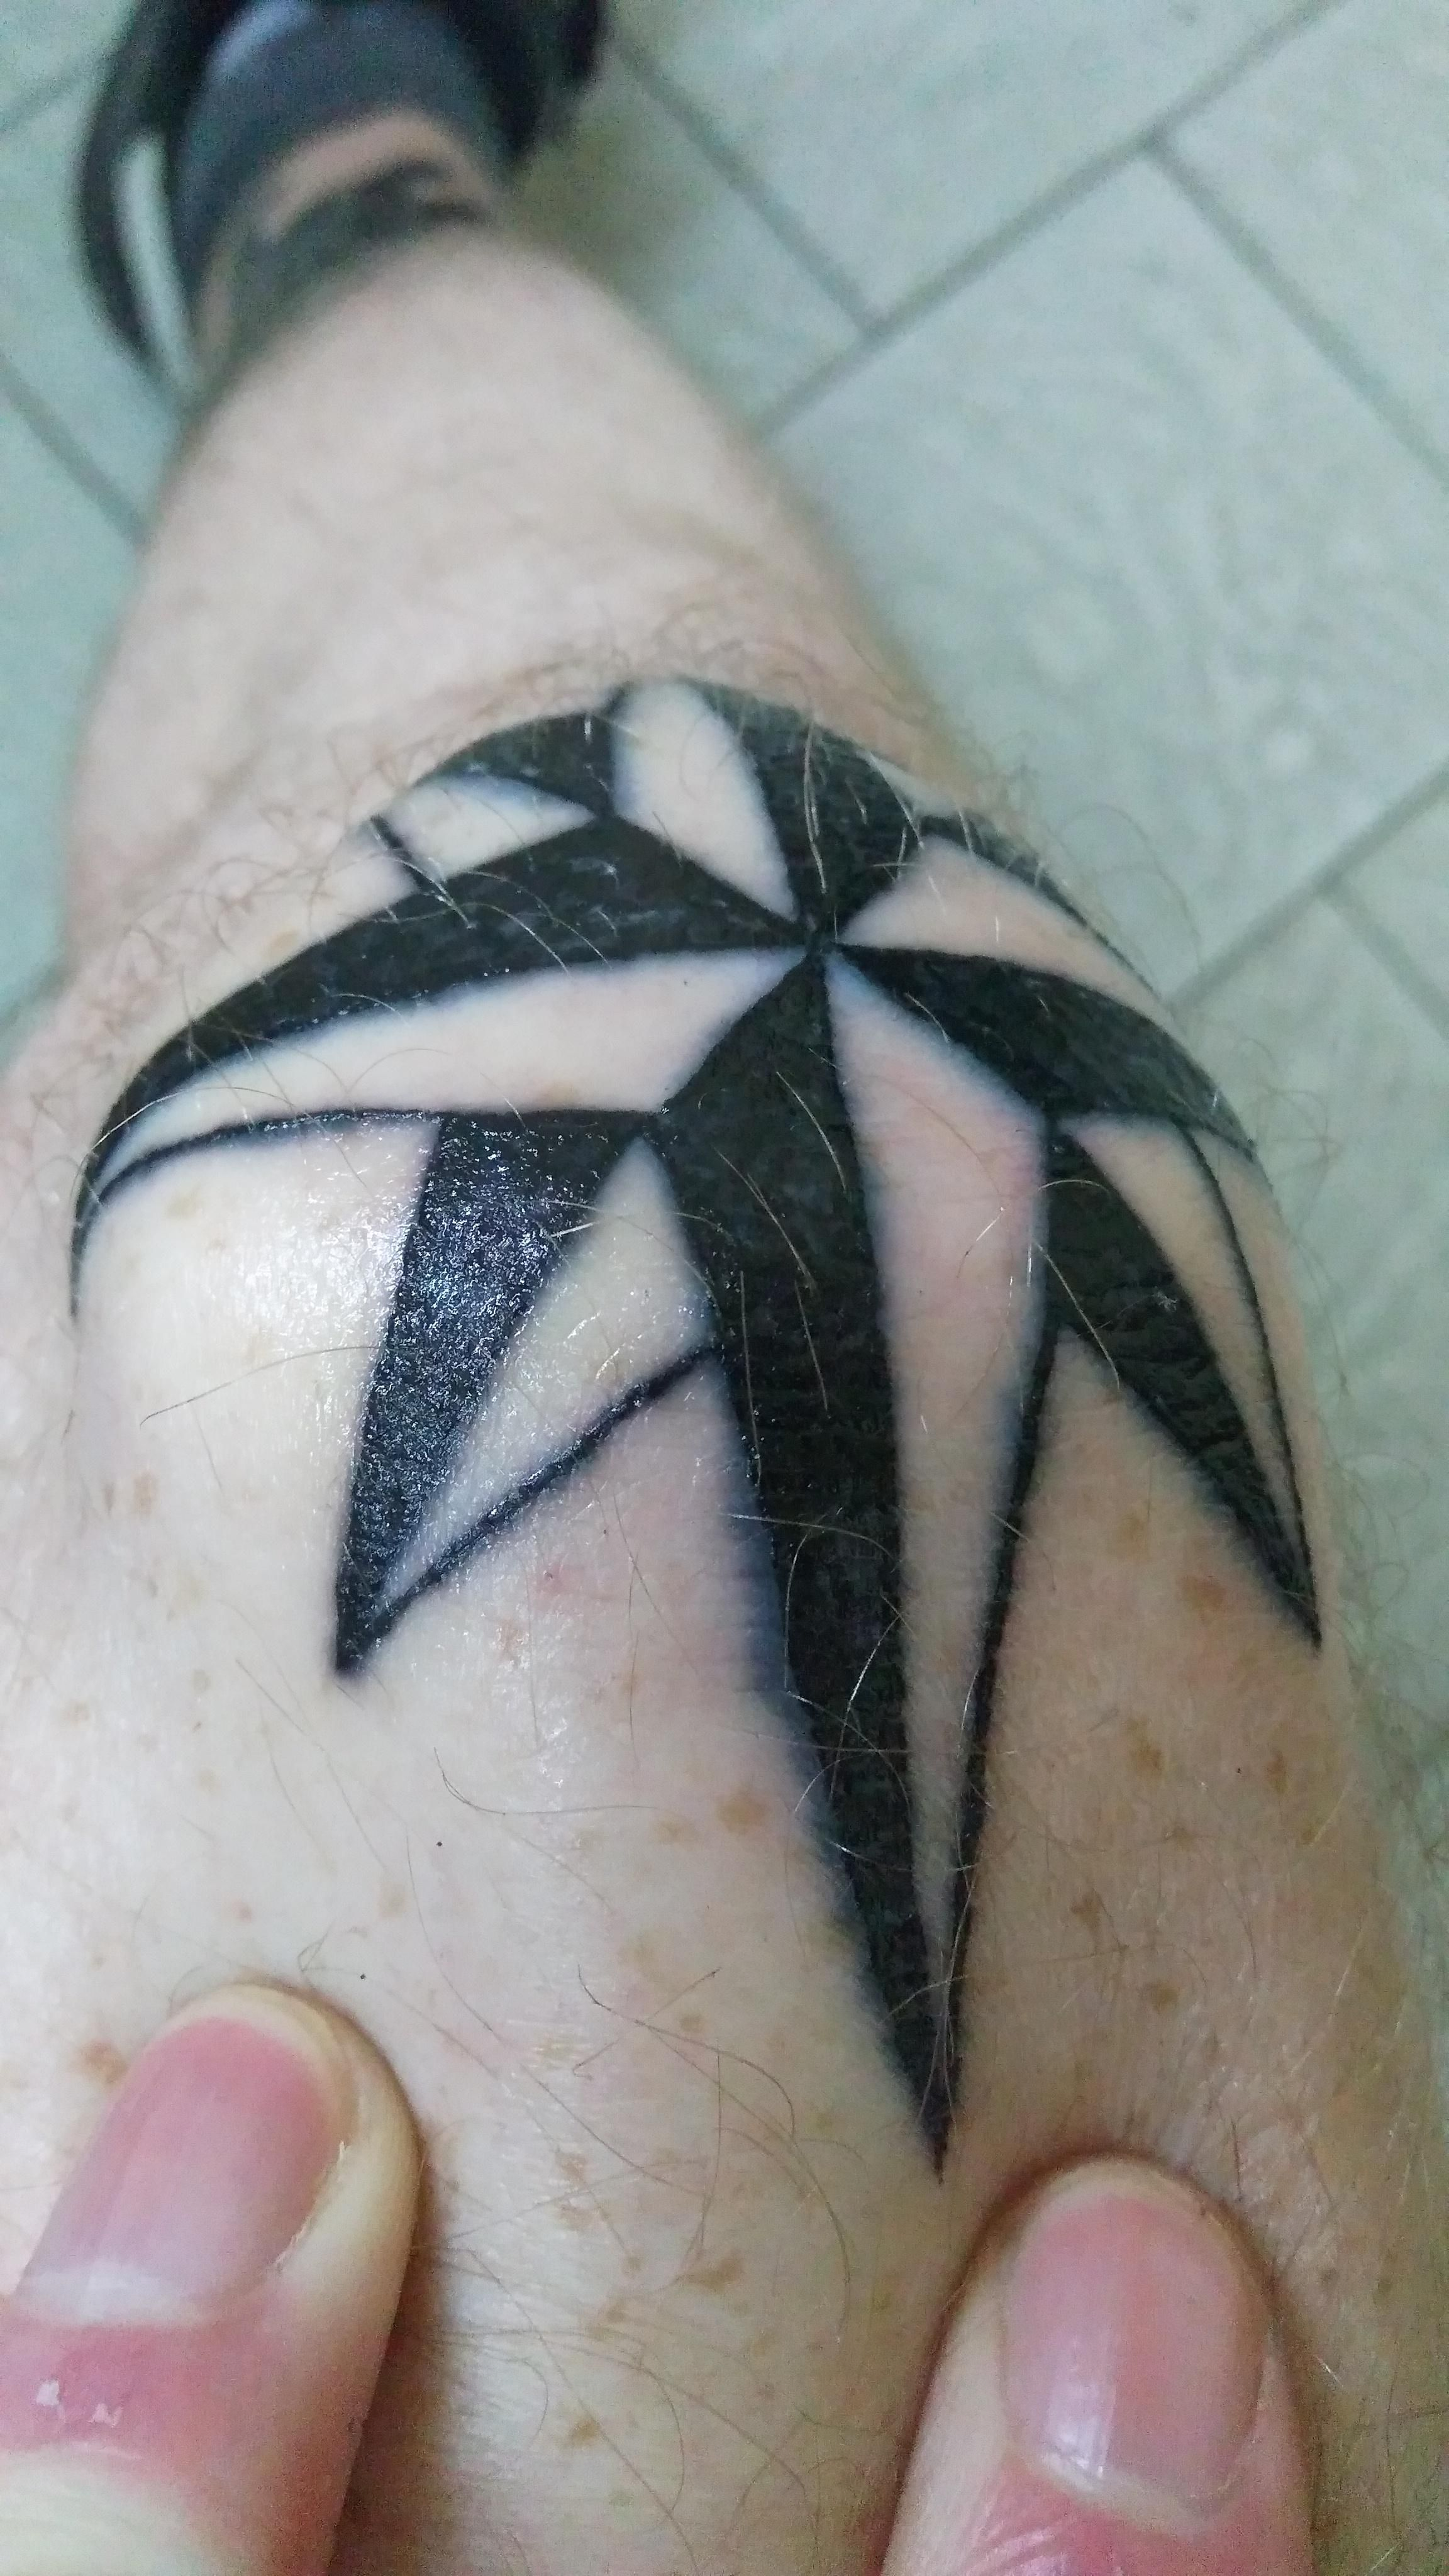 Knee Tattoo Blowout Tattoo Blowout Knee Tattoo Body Art Tattoos